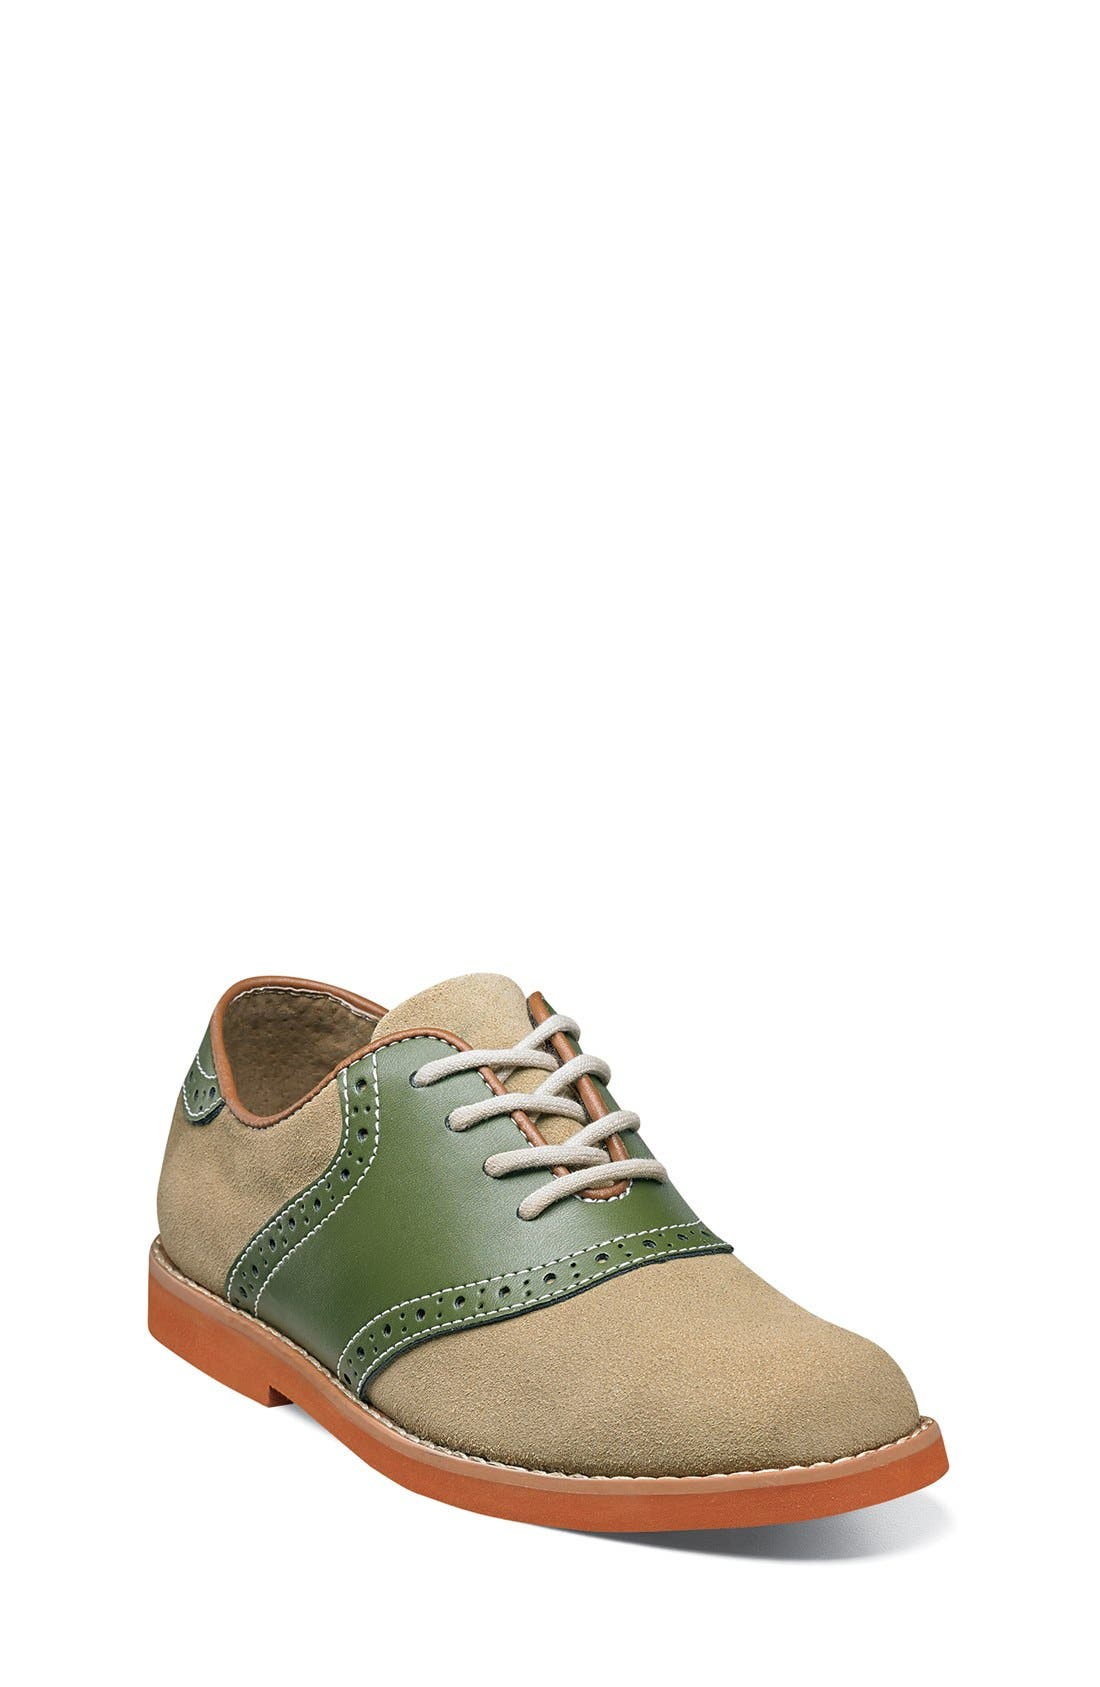 Florsheim 'Kennett Jr.' Saddle Shoe (Toddler, Little Kid & Big Kid)